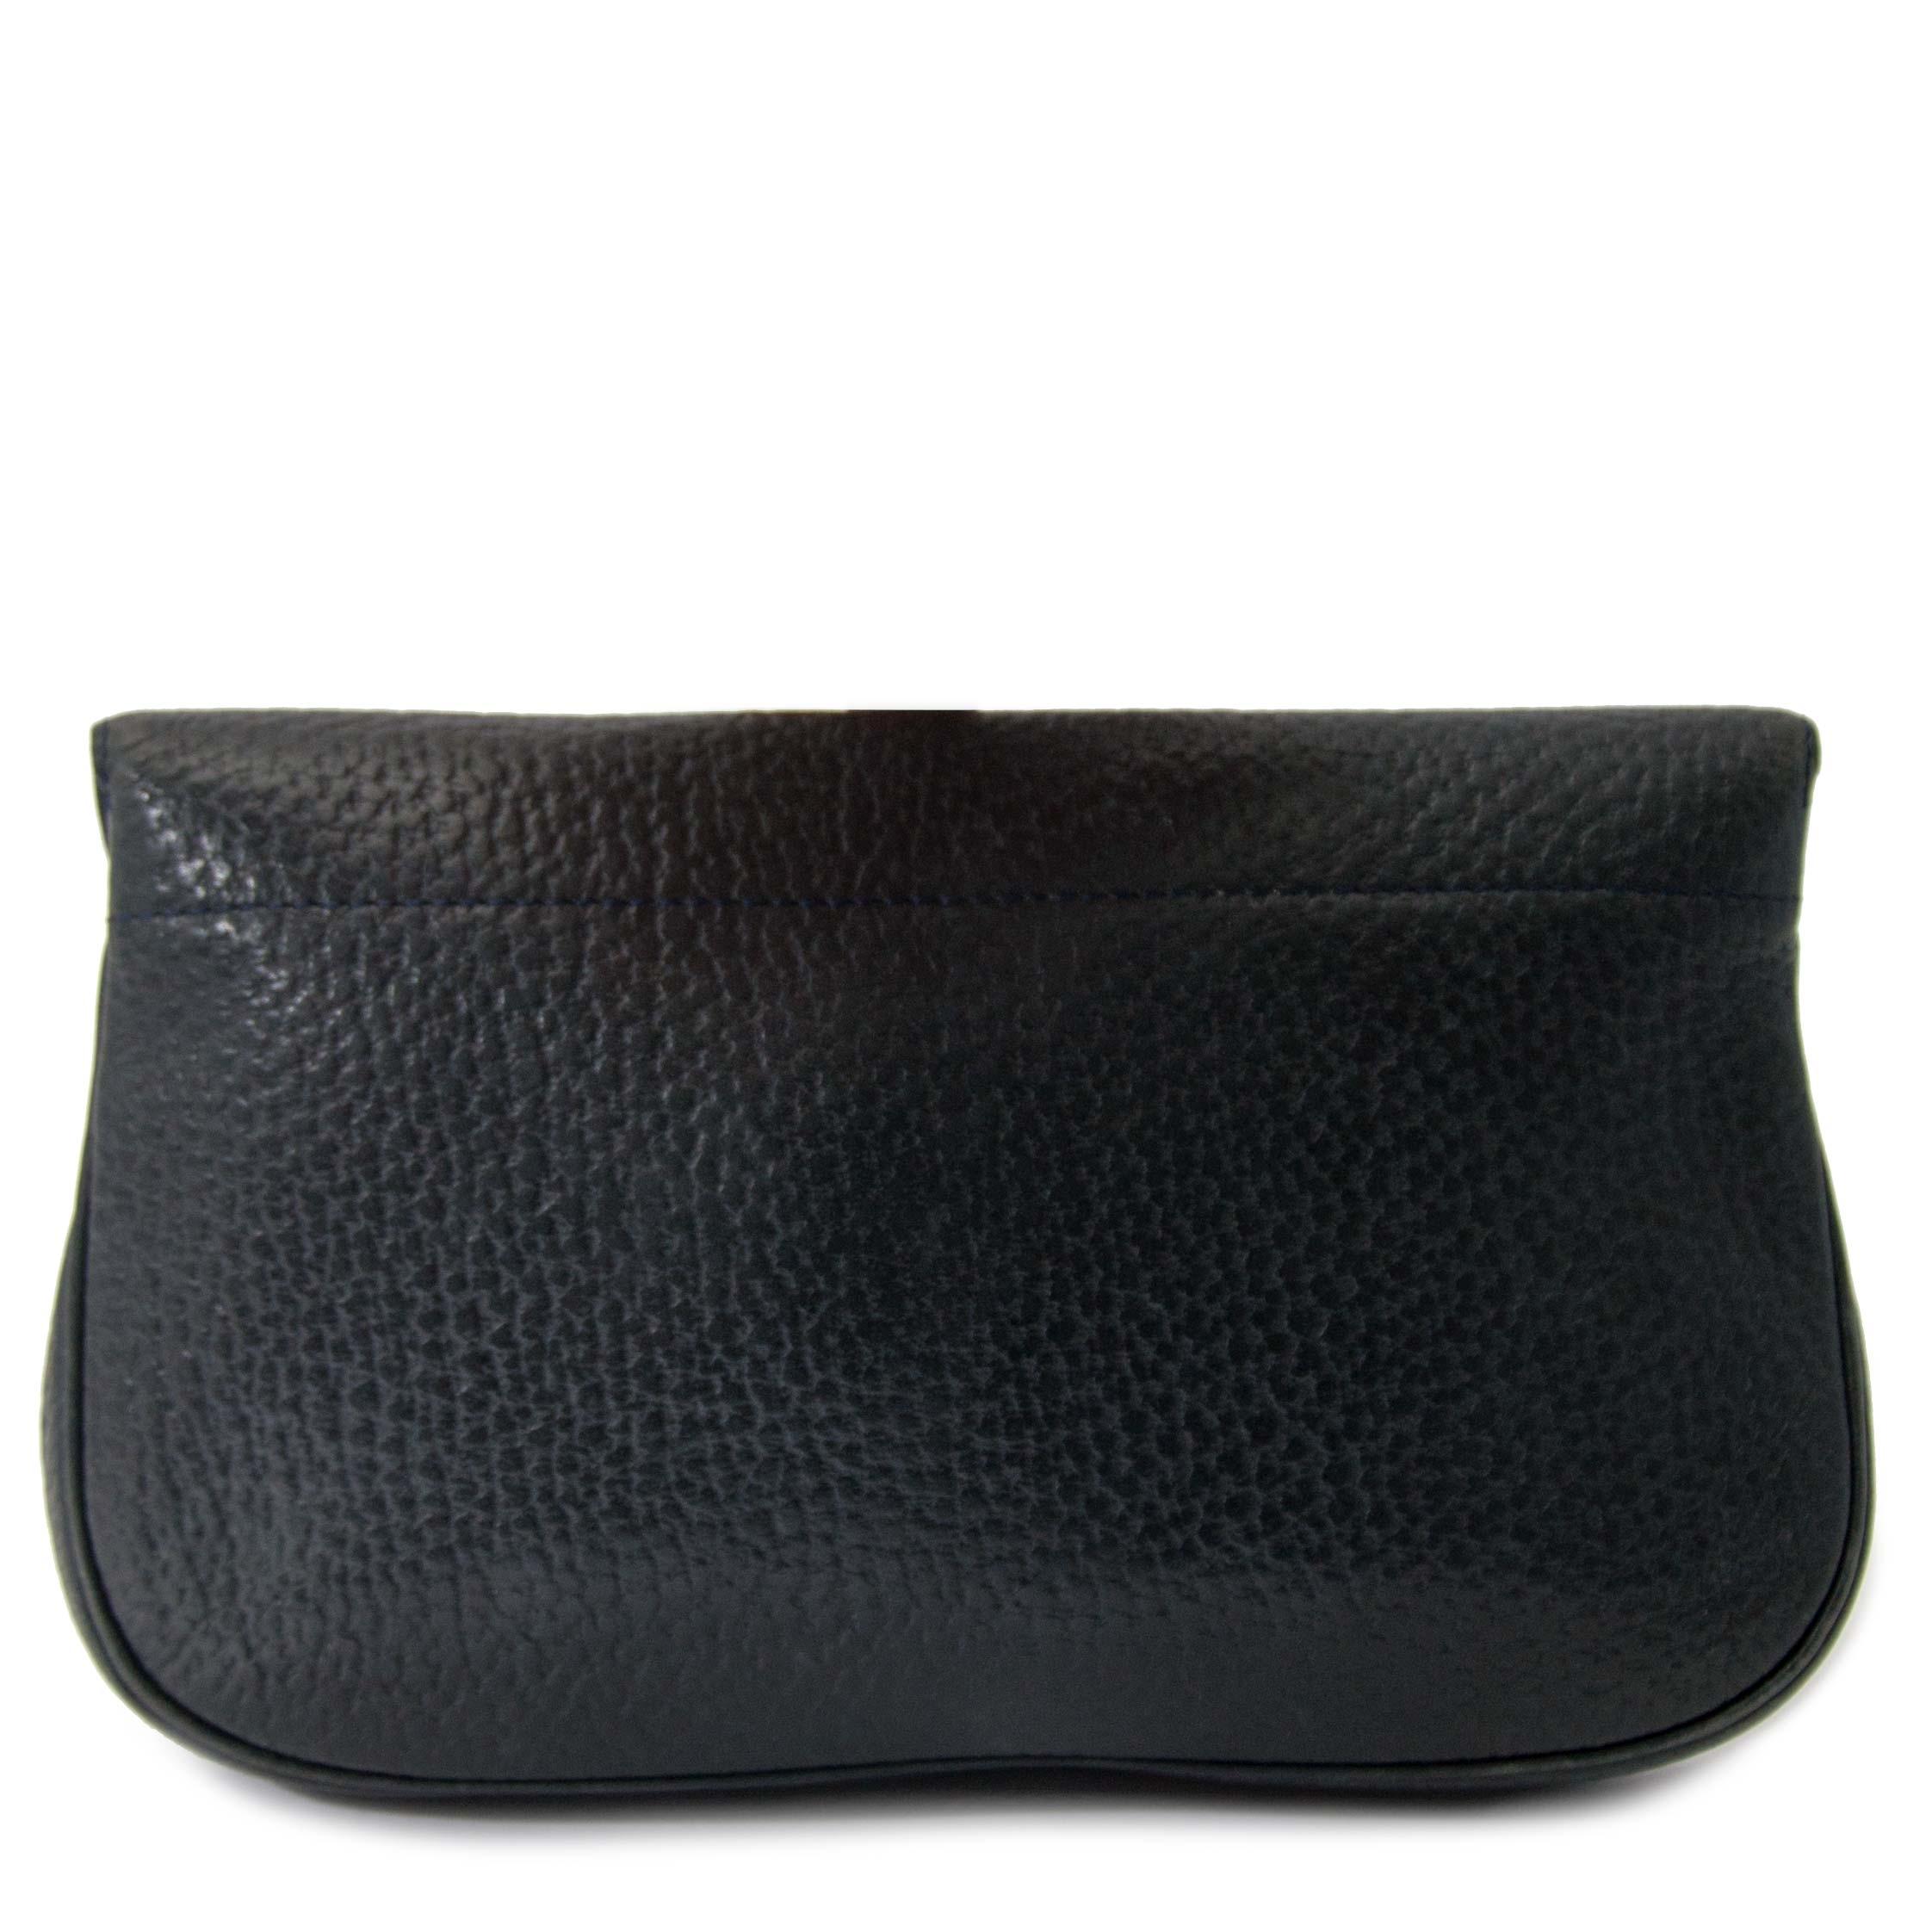 032a8688515 Delvaux Dark Blue Leather Pochette for sale online at Labellov secondhand  luxury Koop en verkoop uw authentieke designer tassen bij Labellov in  Antwerpen